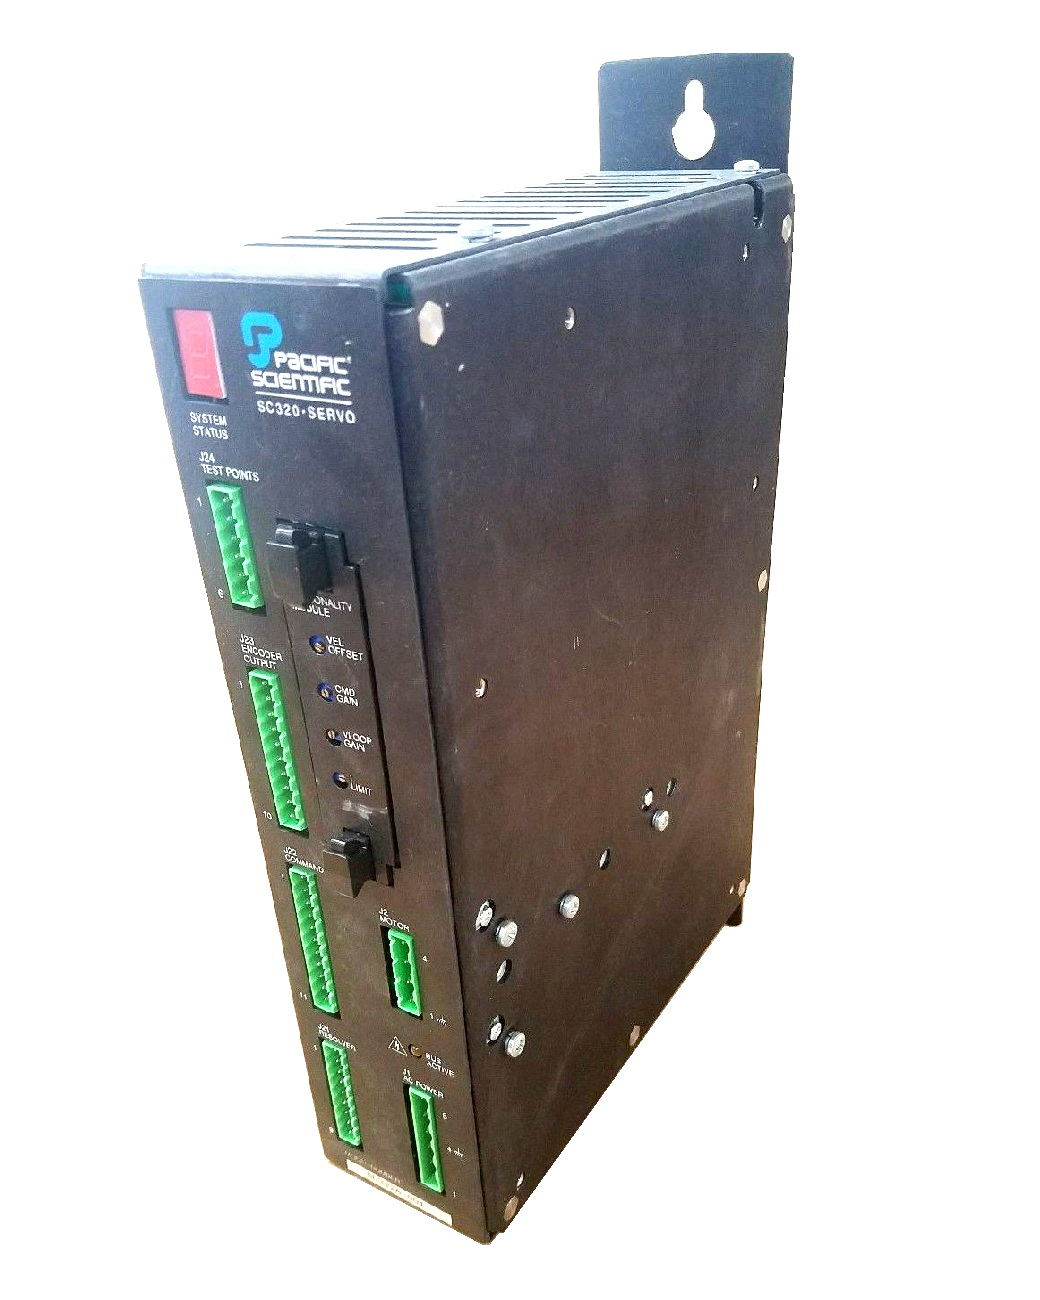 SC320 Series Servo Drive Controllers